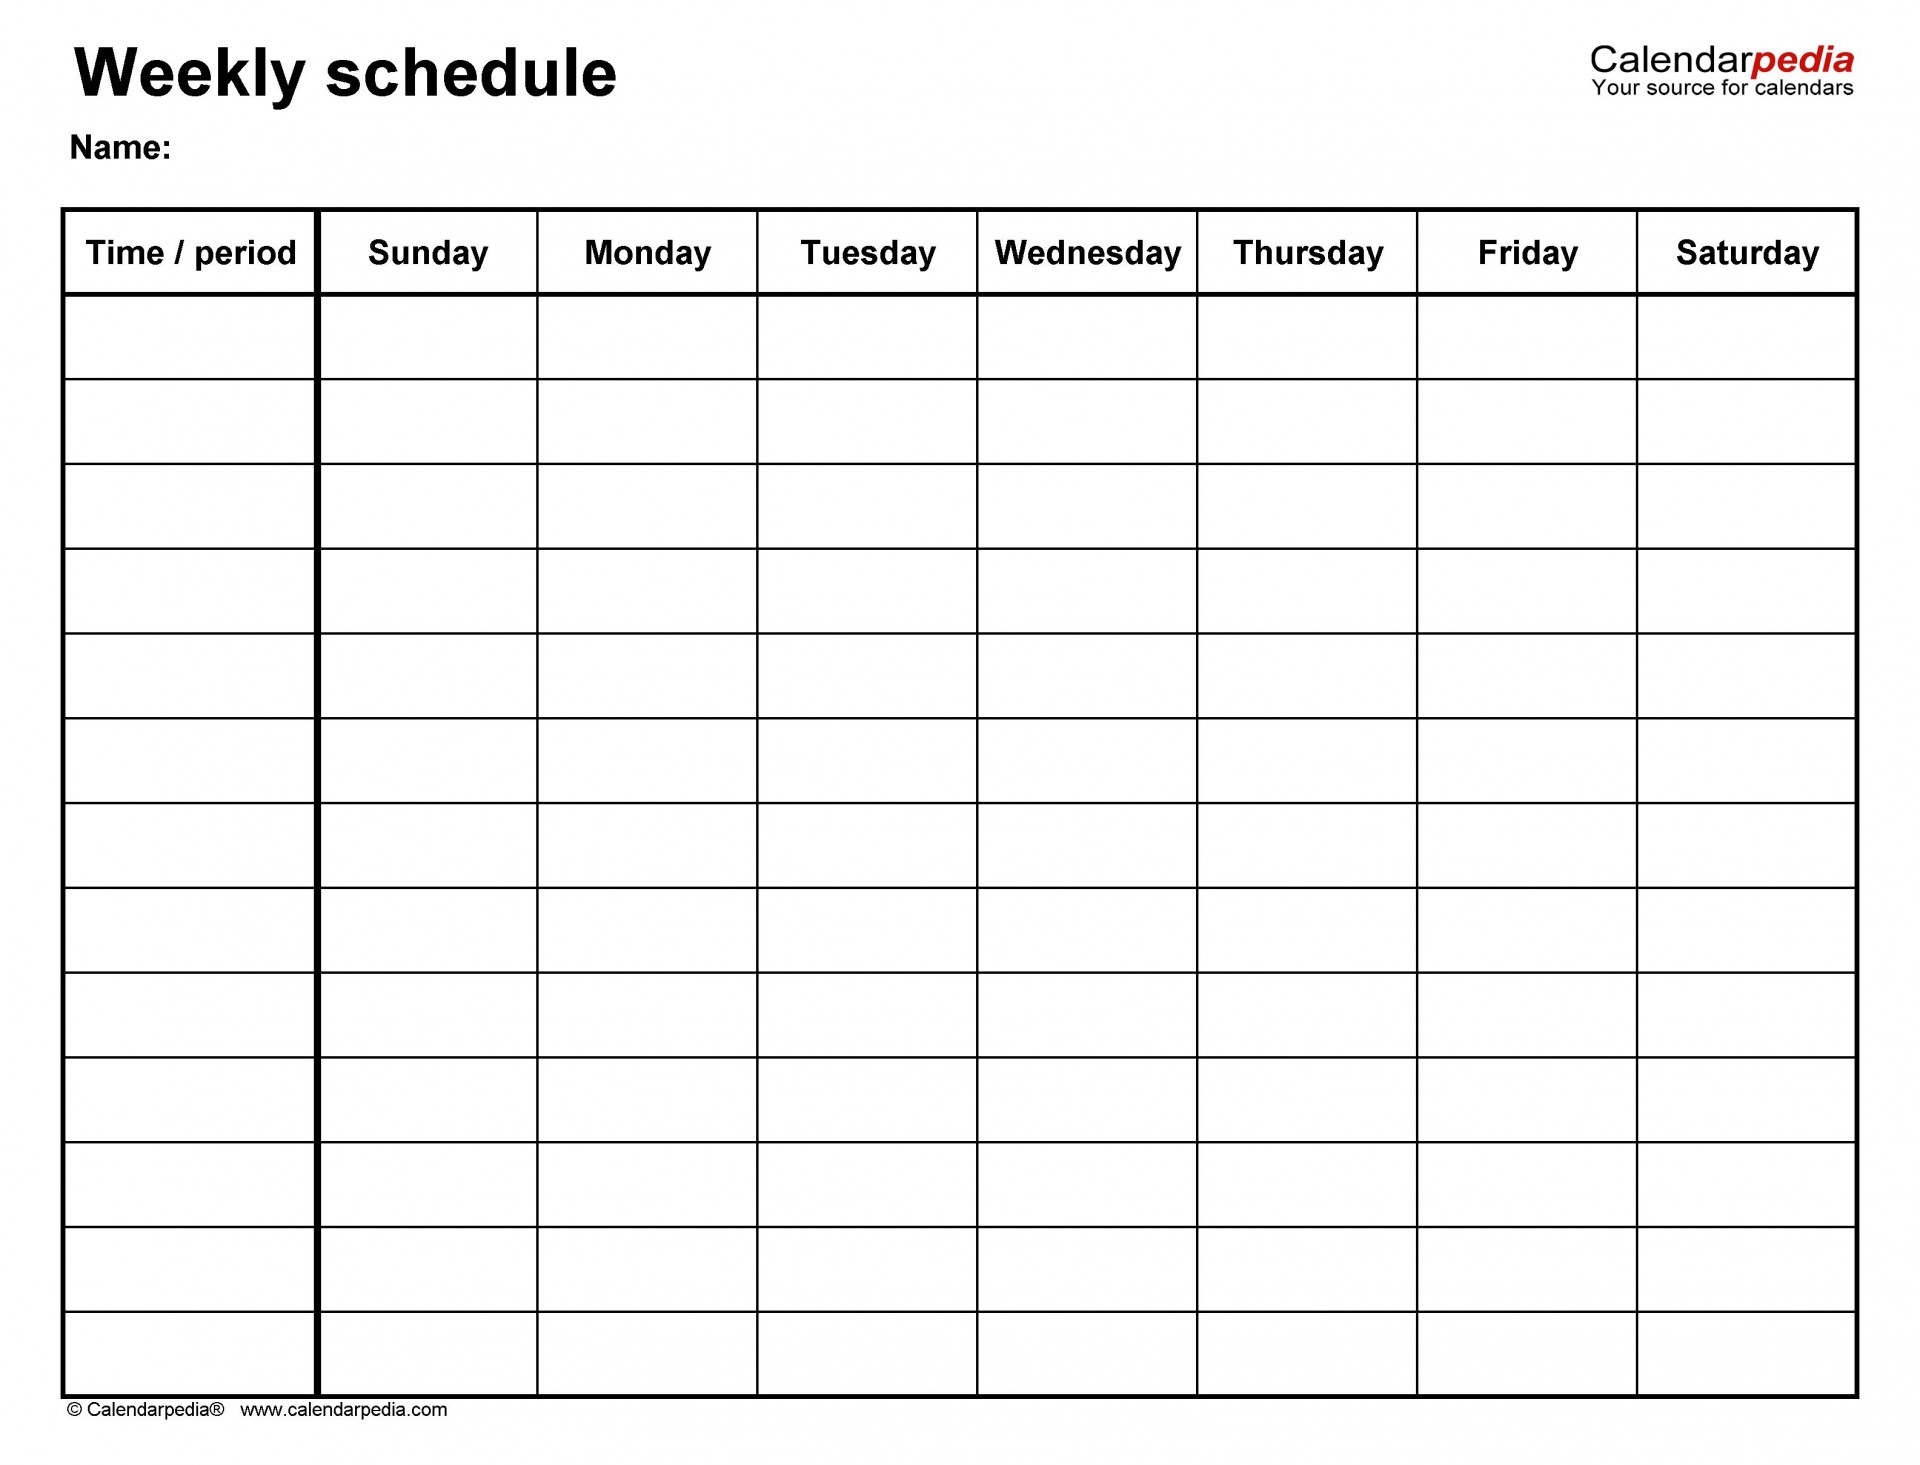 009 Shocking Hourly Schedule Template Word High Resolution  Calendar Microsoft Work1920